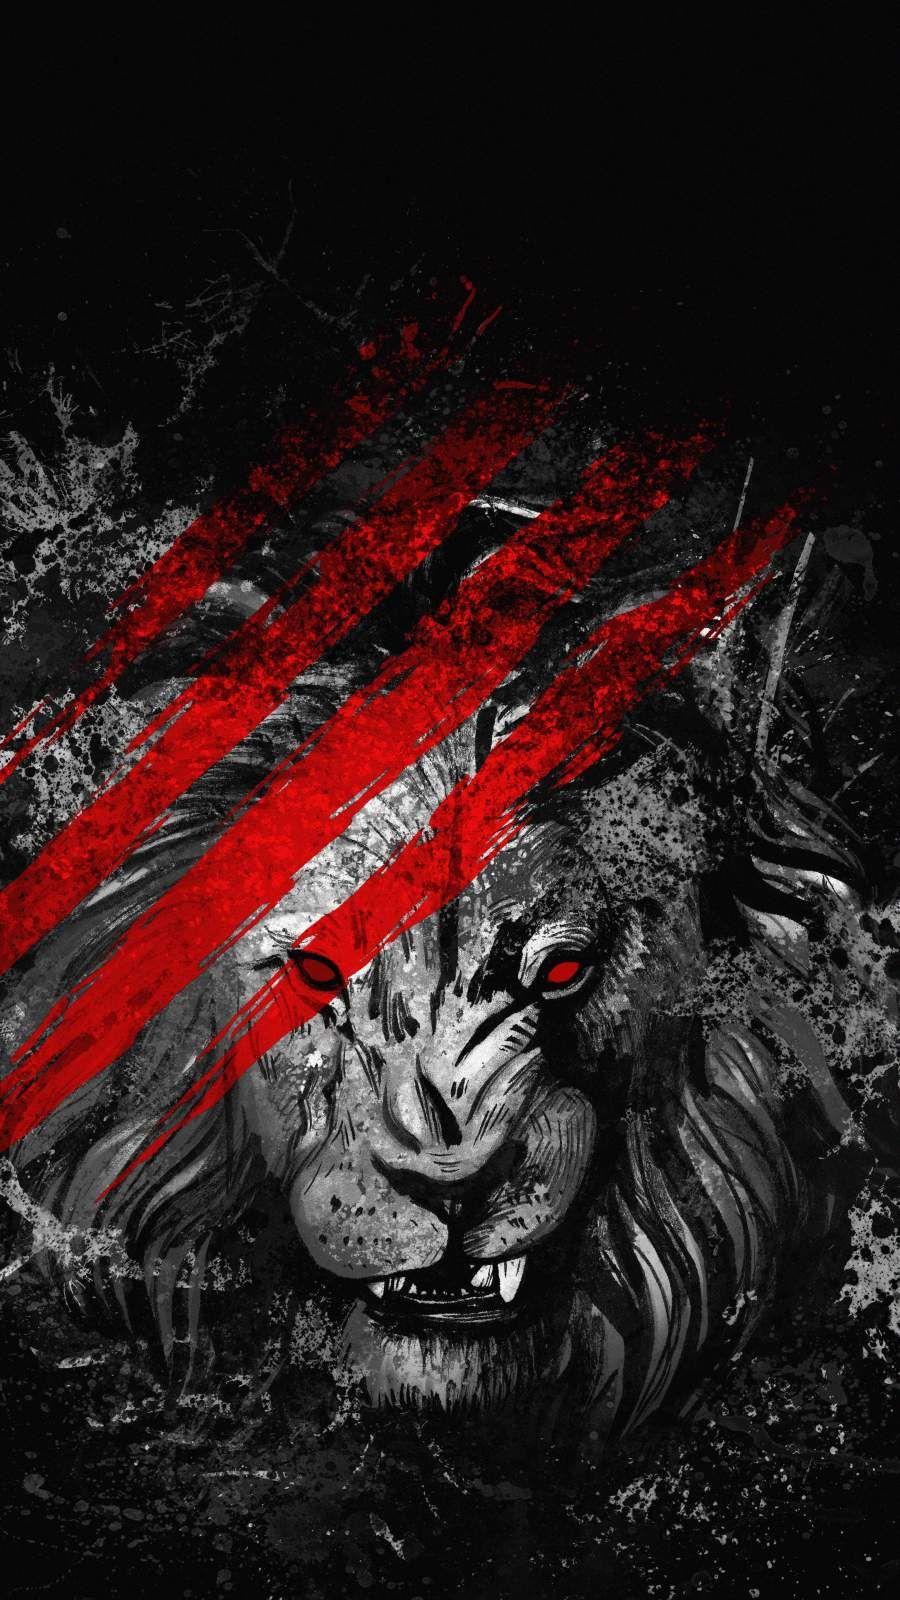 Lion Art iPhone Wallpaper - iPhone Wallpapers